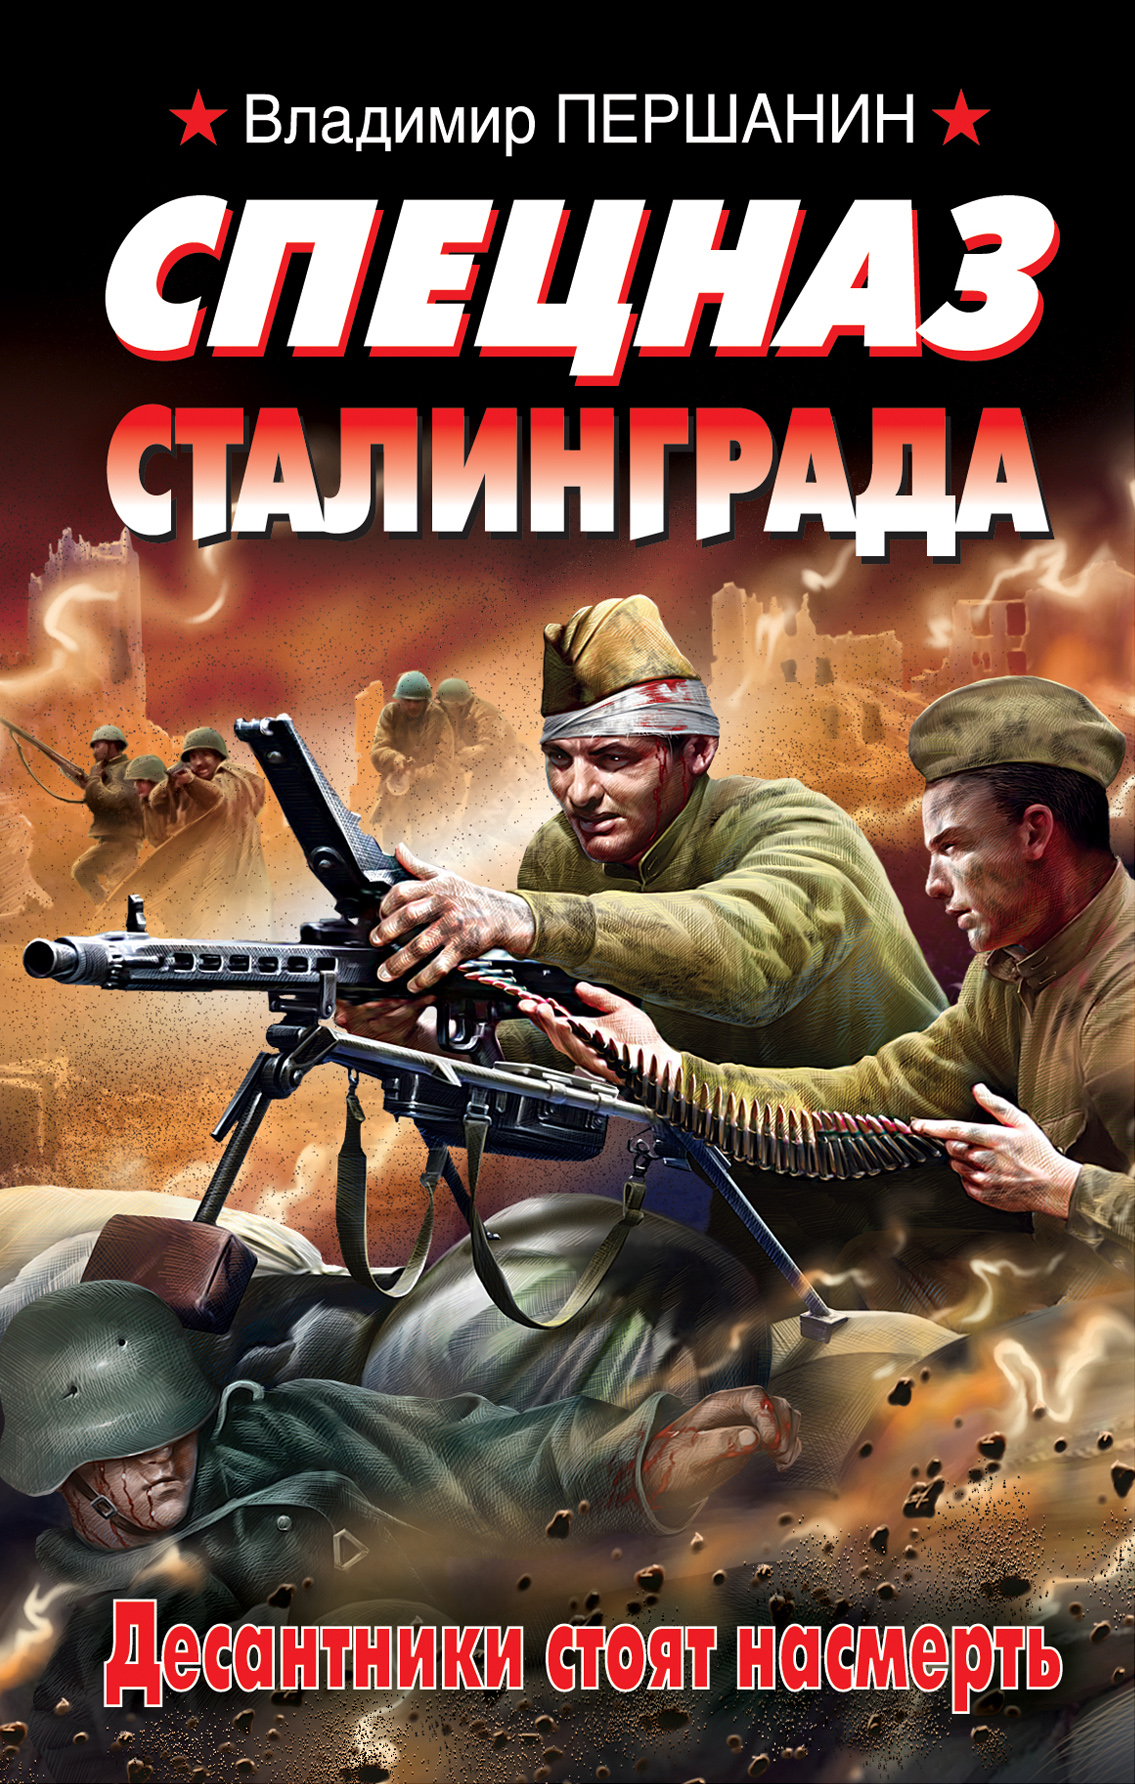 Спецназ Сталинграда